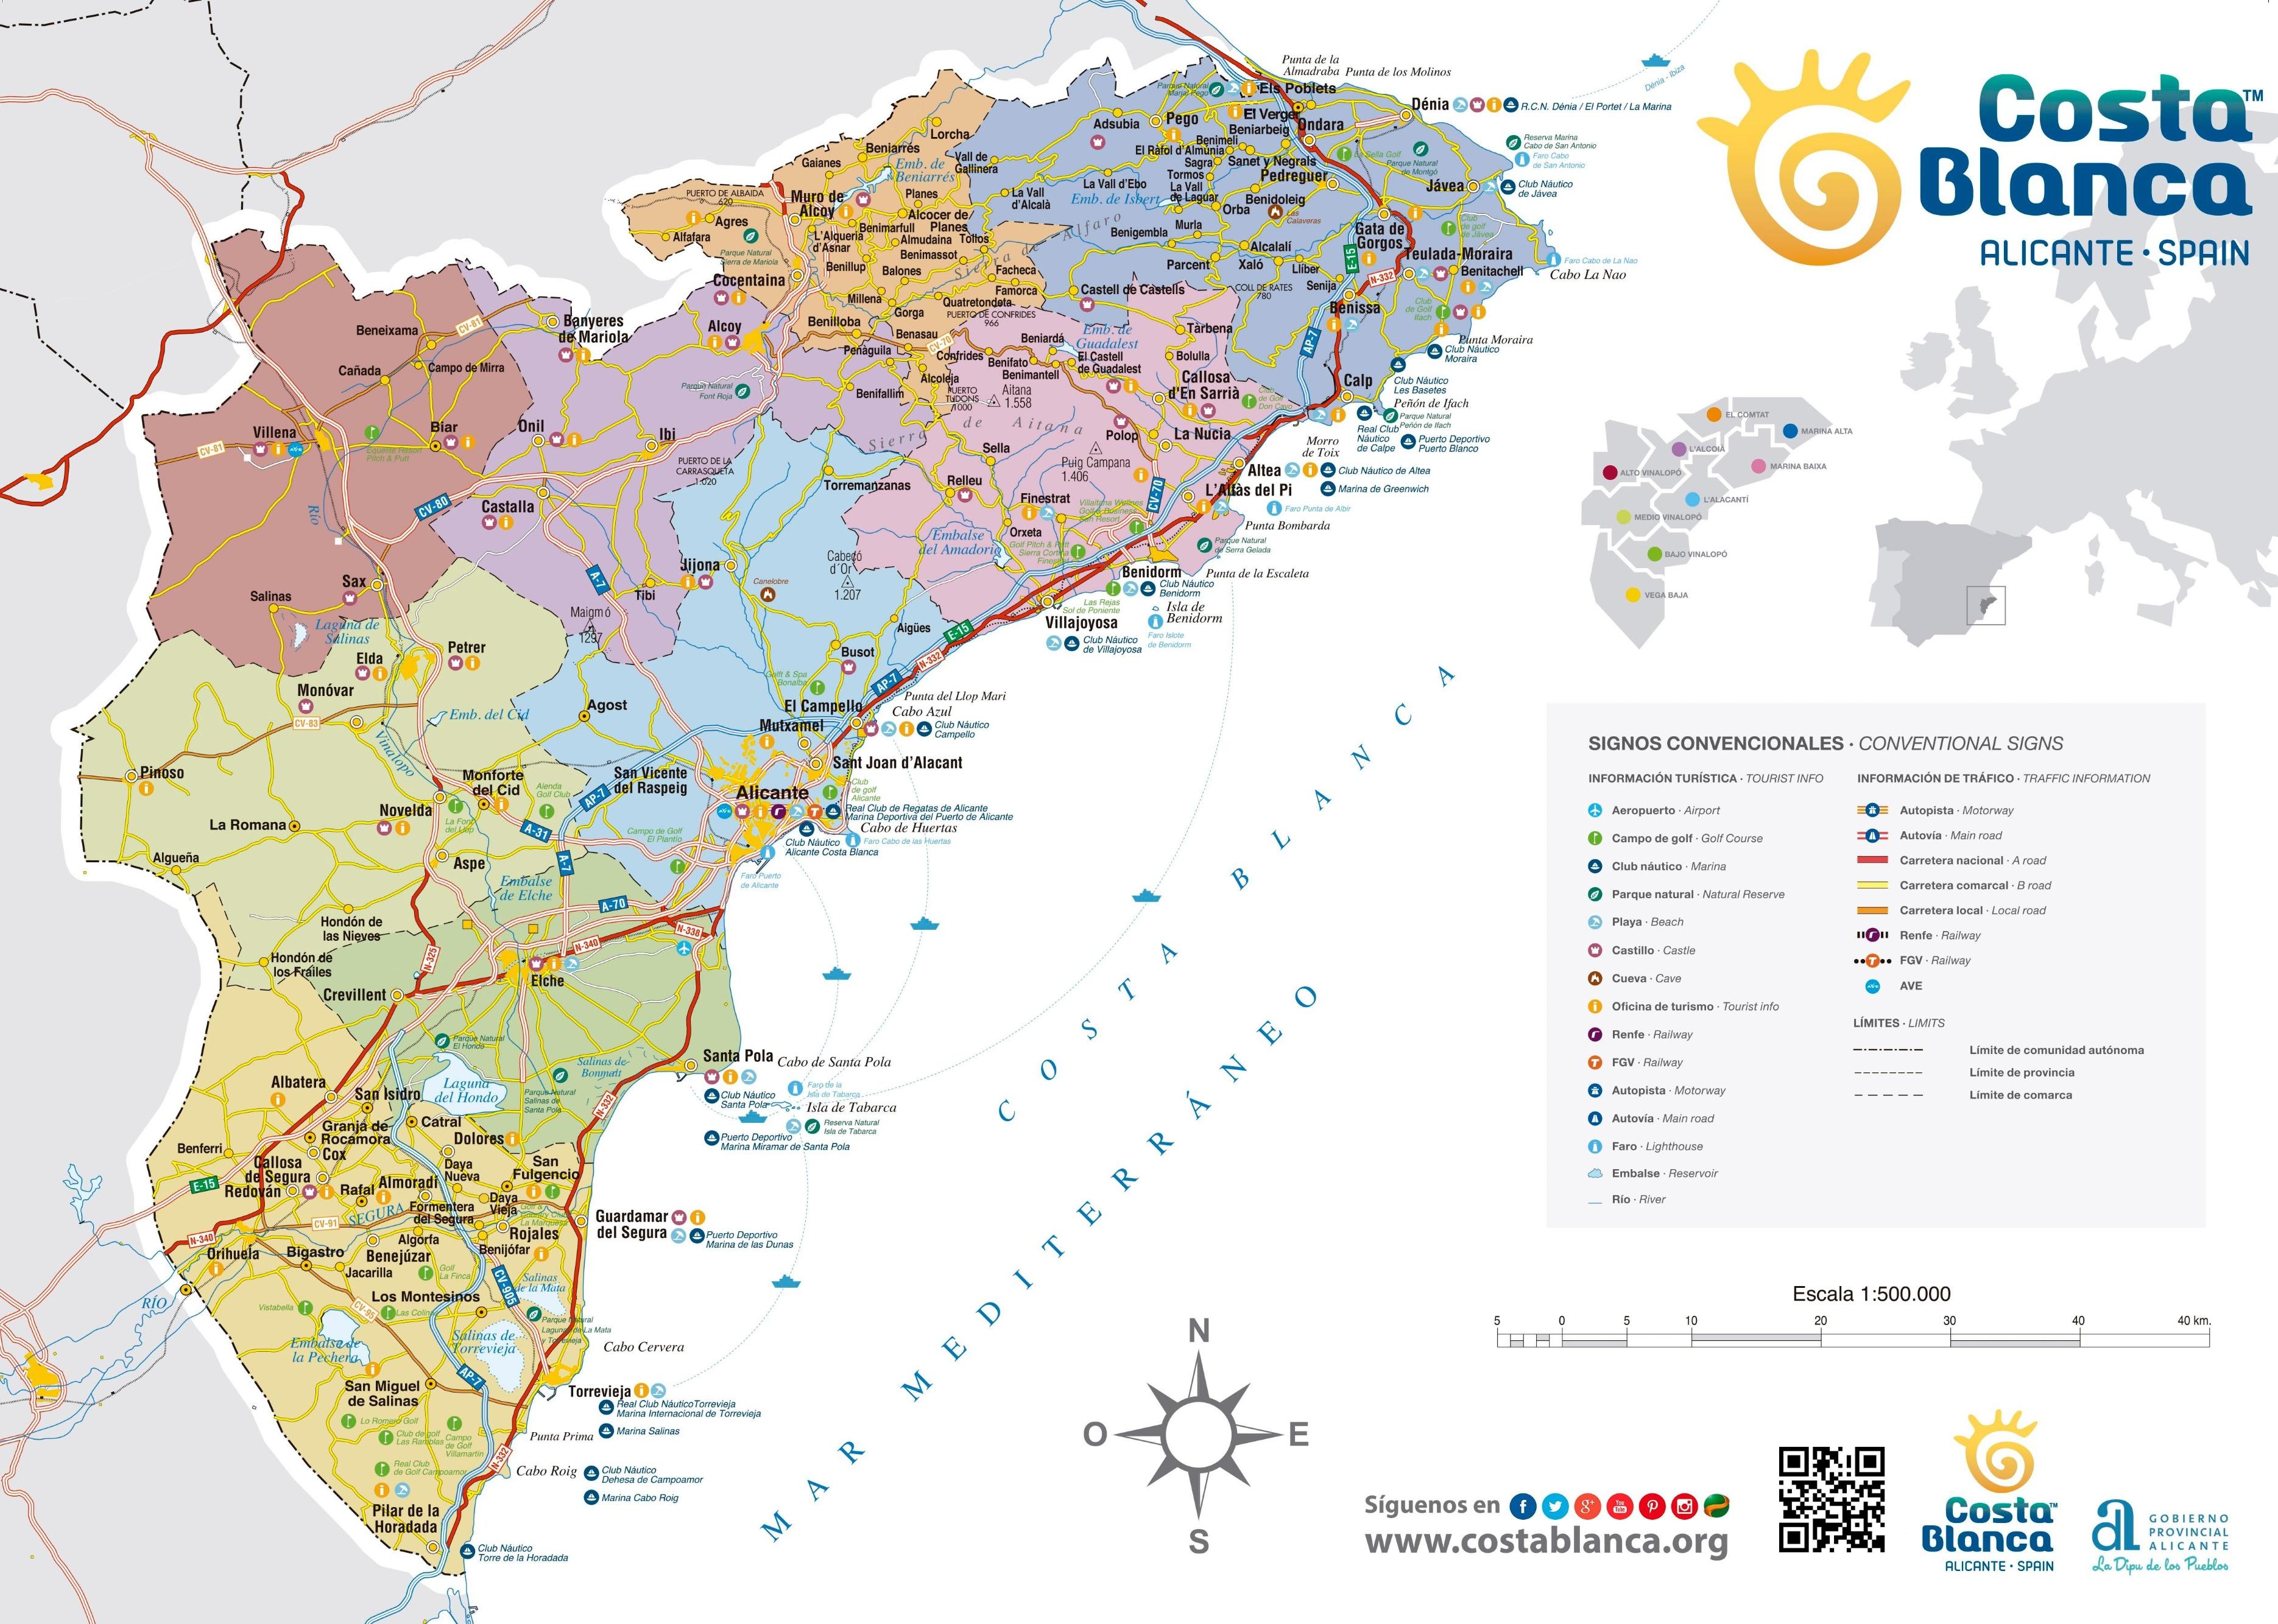 Map Of Costa Blanca Costa Blanca tourist map Map Of Costa Blanca